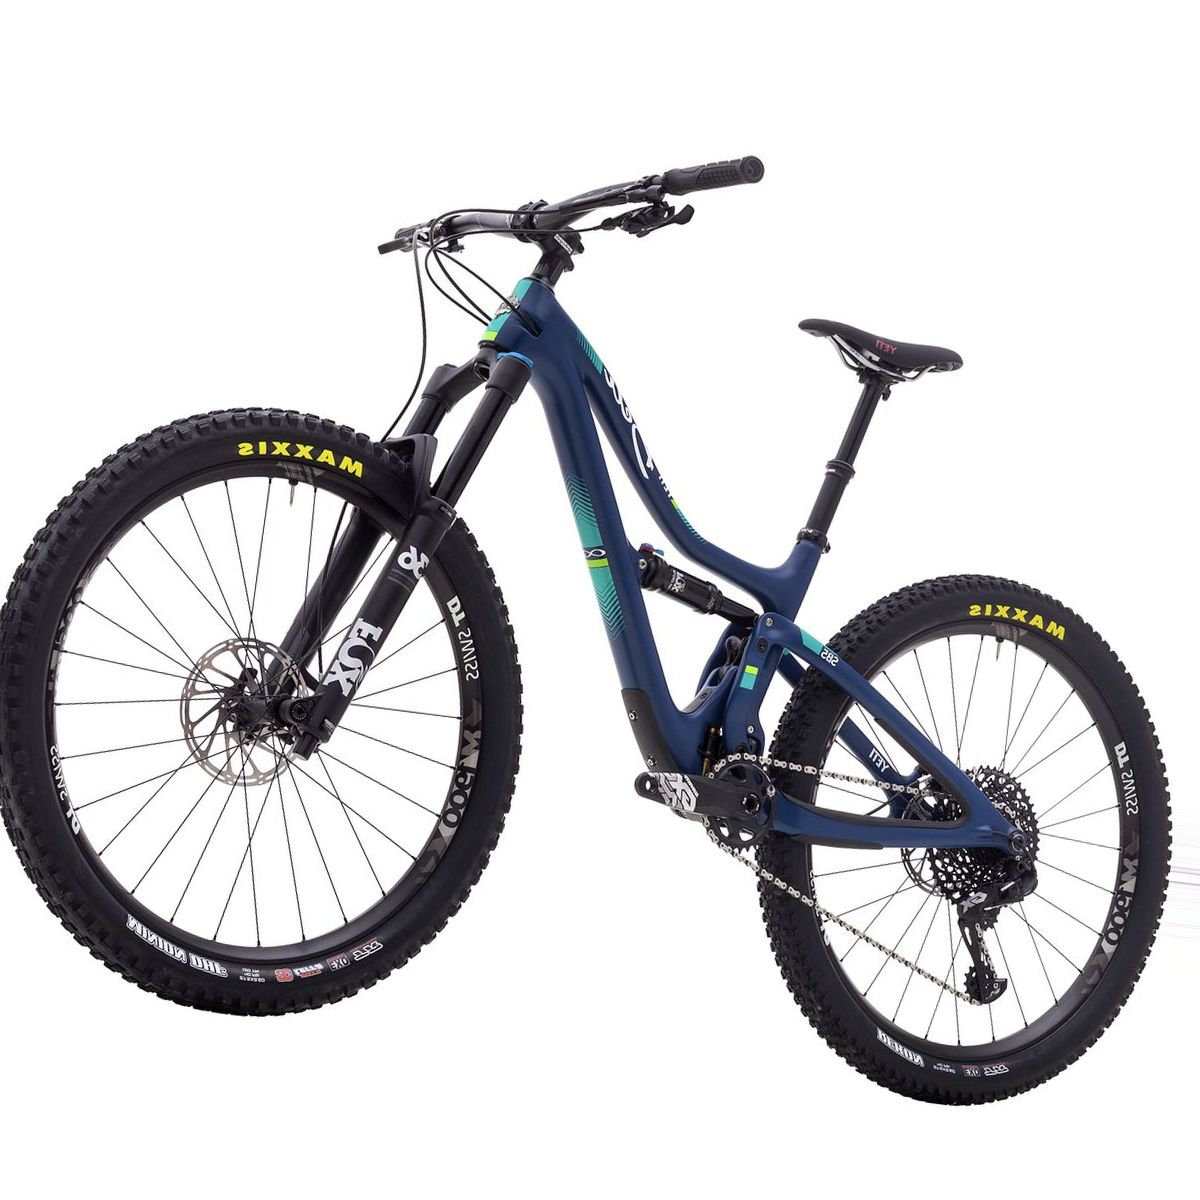 Yeti Cycles SB5 Beti Carbon GX Eagle Mountain Bike - Women's